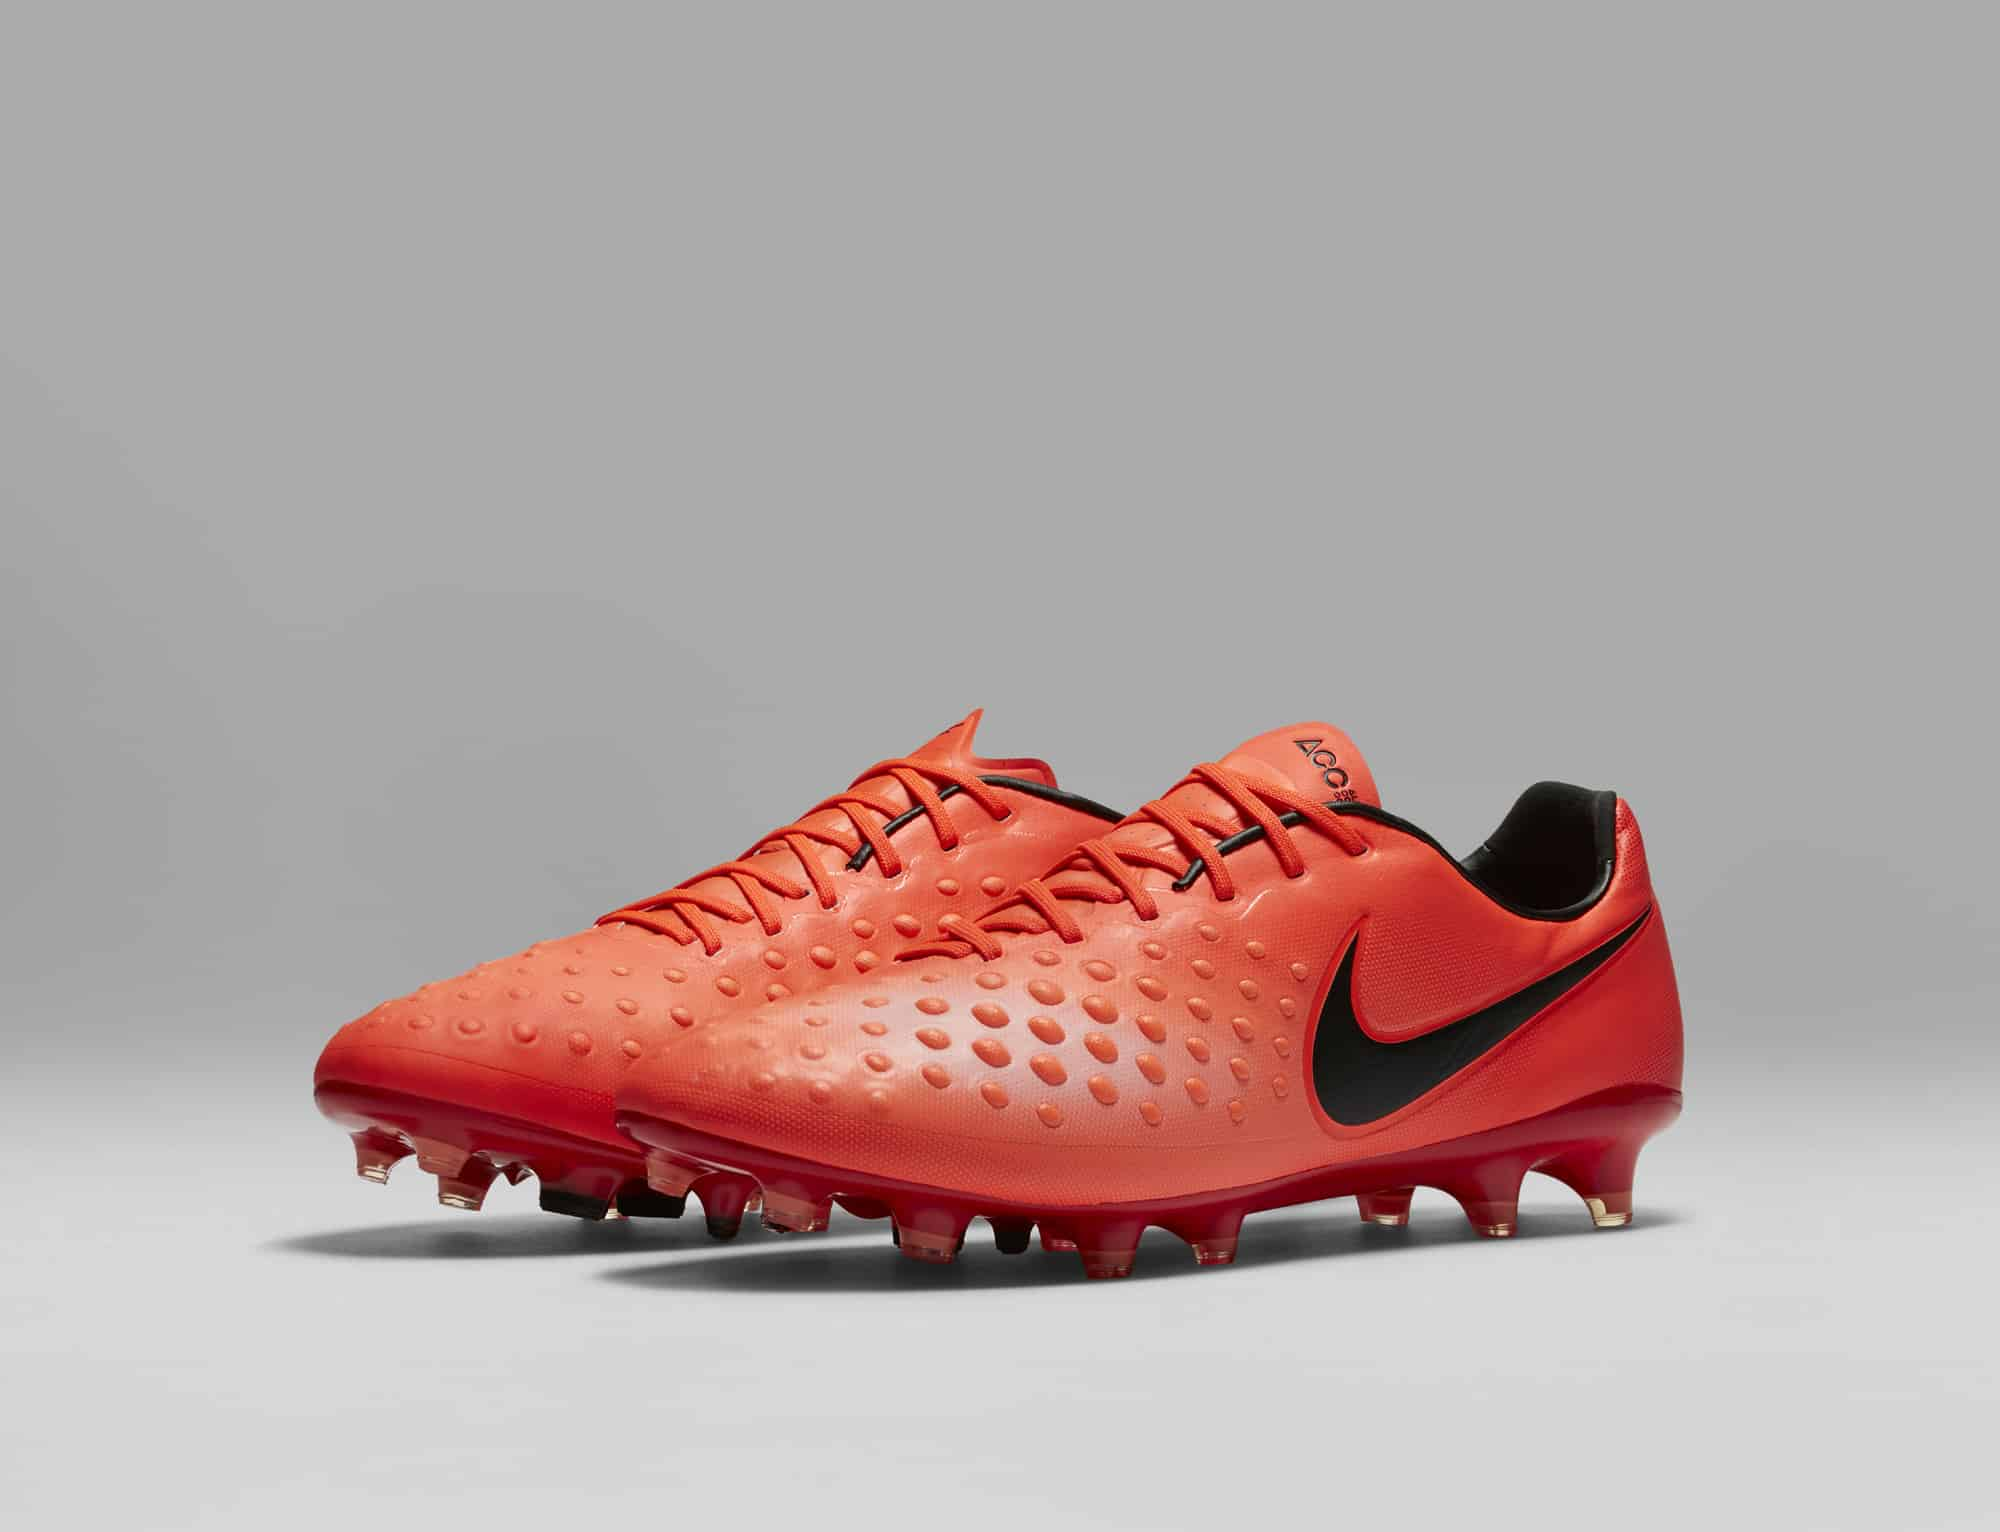 chaussures-football-Nike-Magista-Opus-2-Men-Radiation-Flare-img2